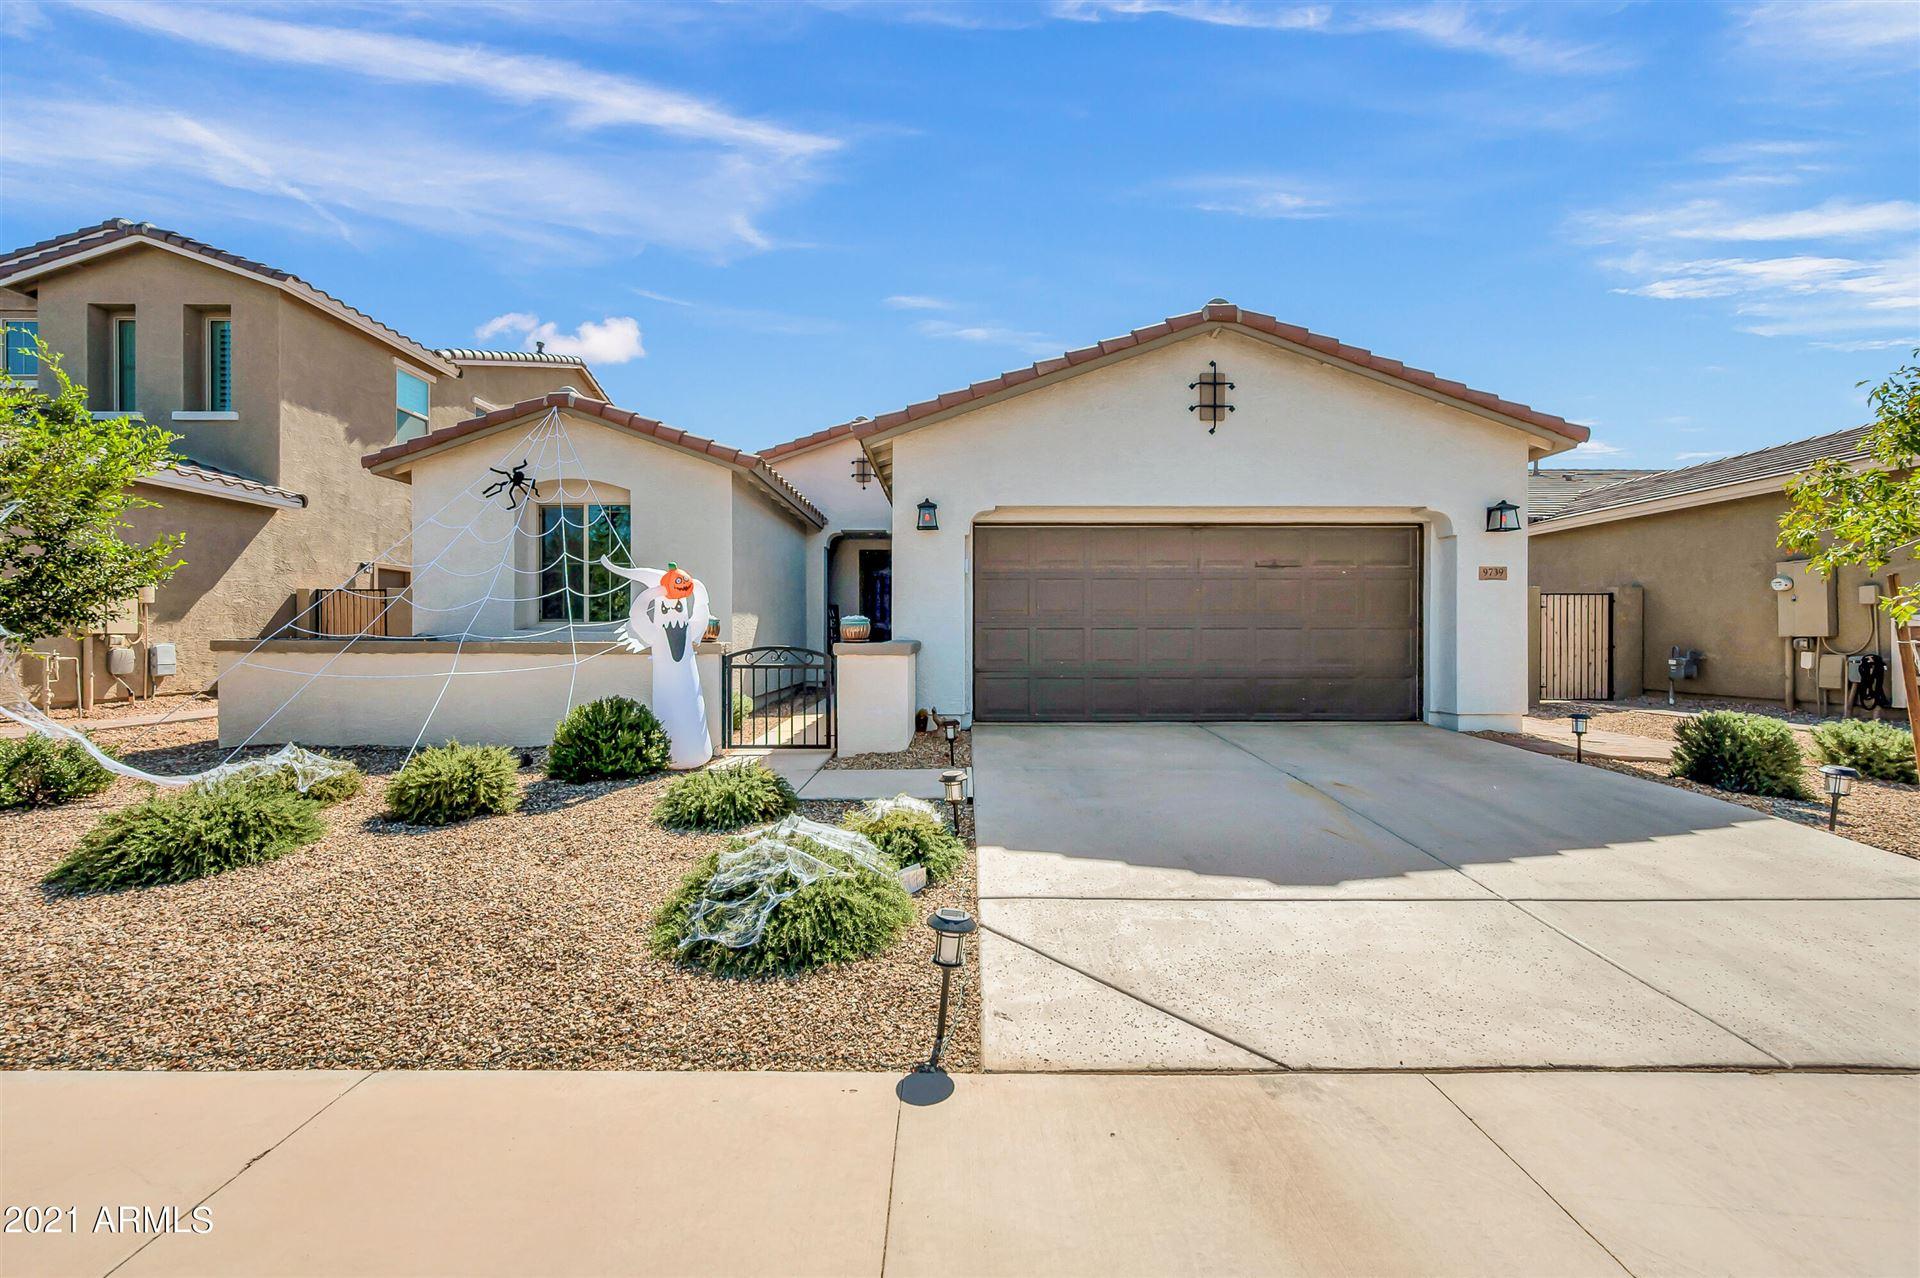 Photo of 9739 E TORINO Avenue, Mesa, AZ 85212 (MLS # 6307646)